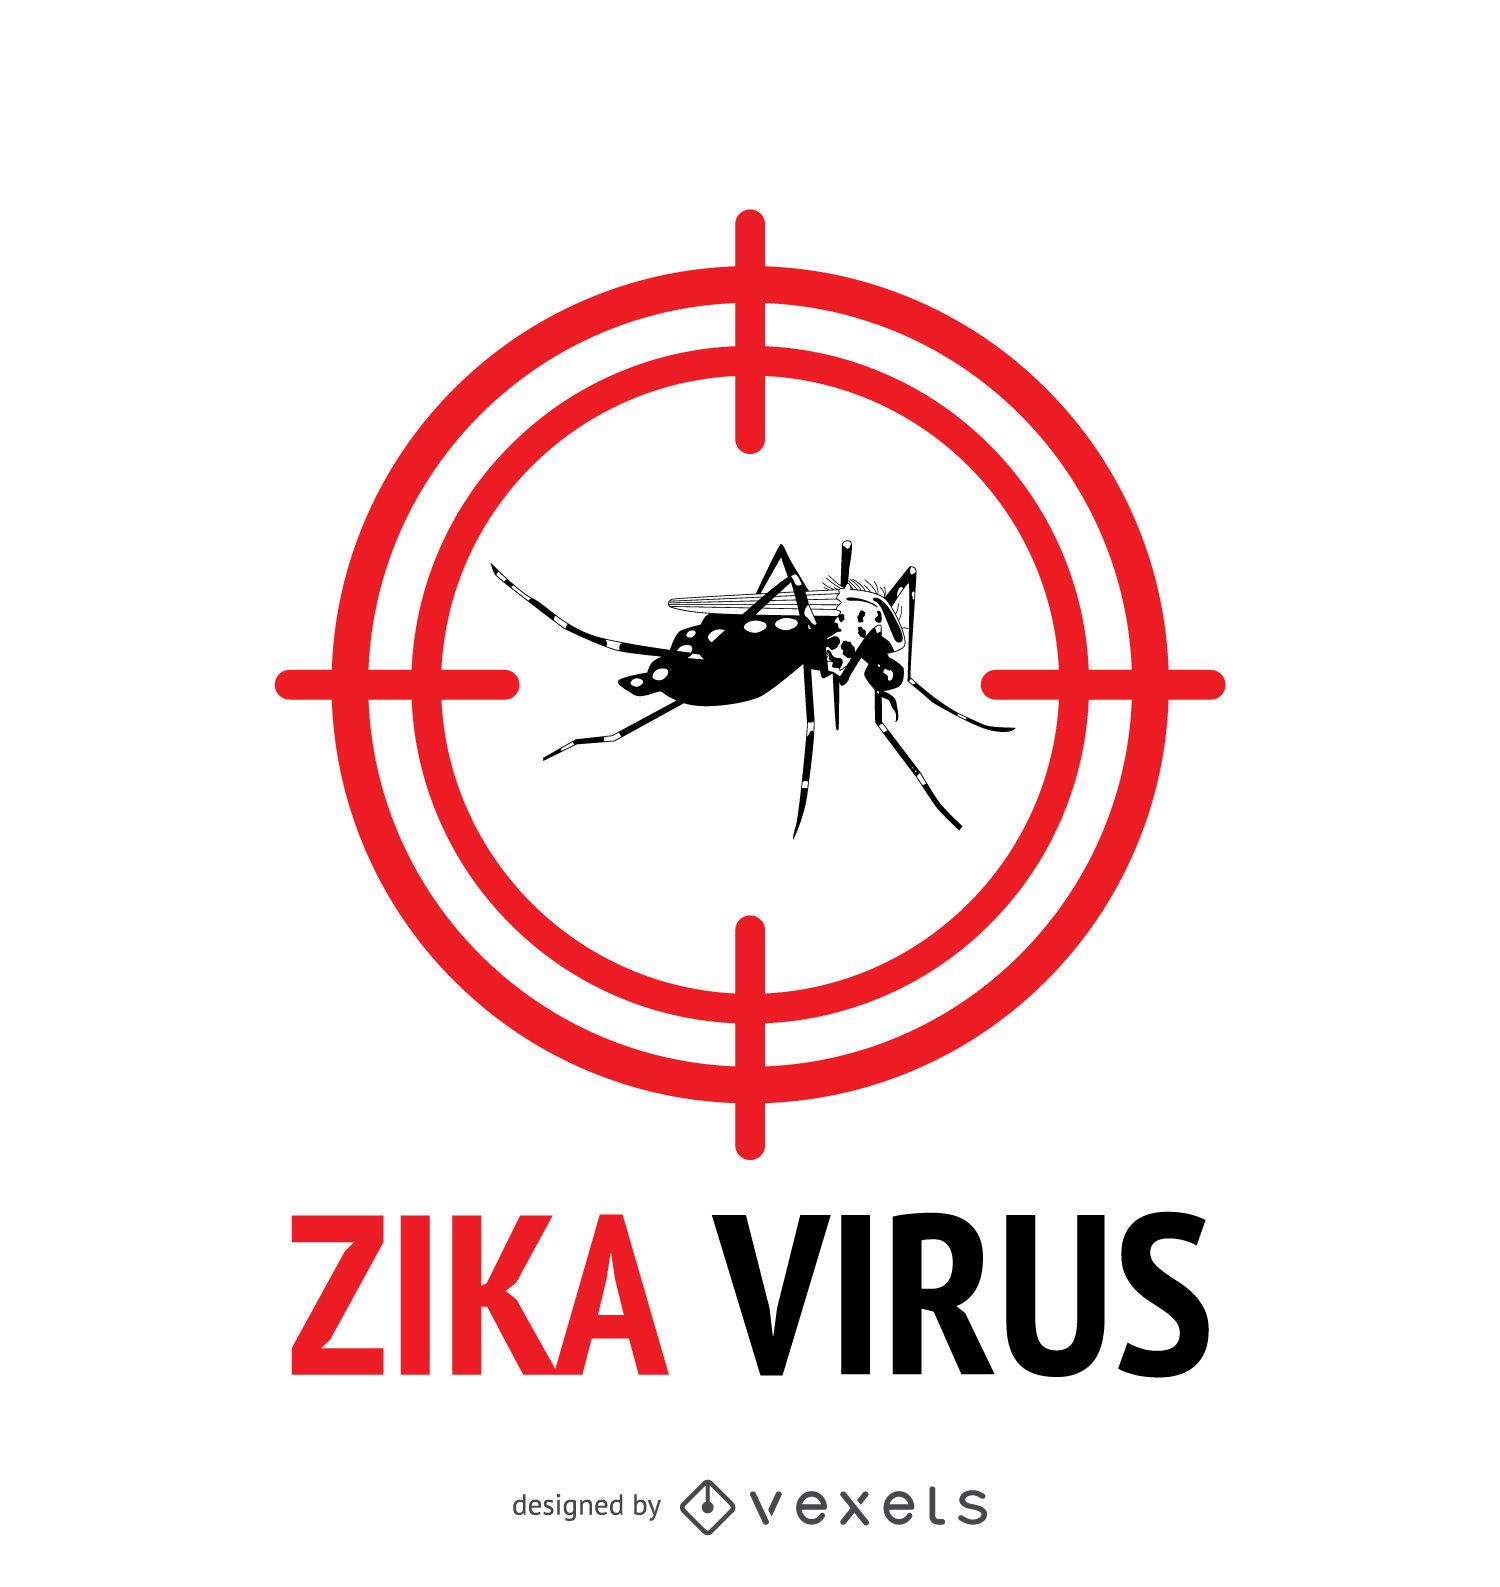 Zika virus alert with